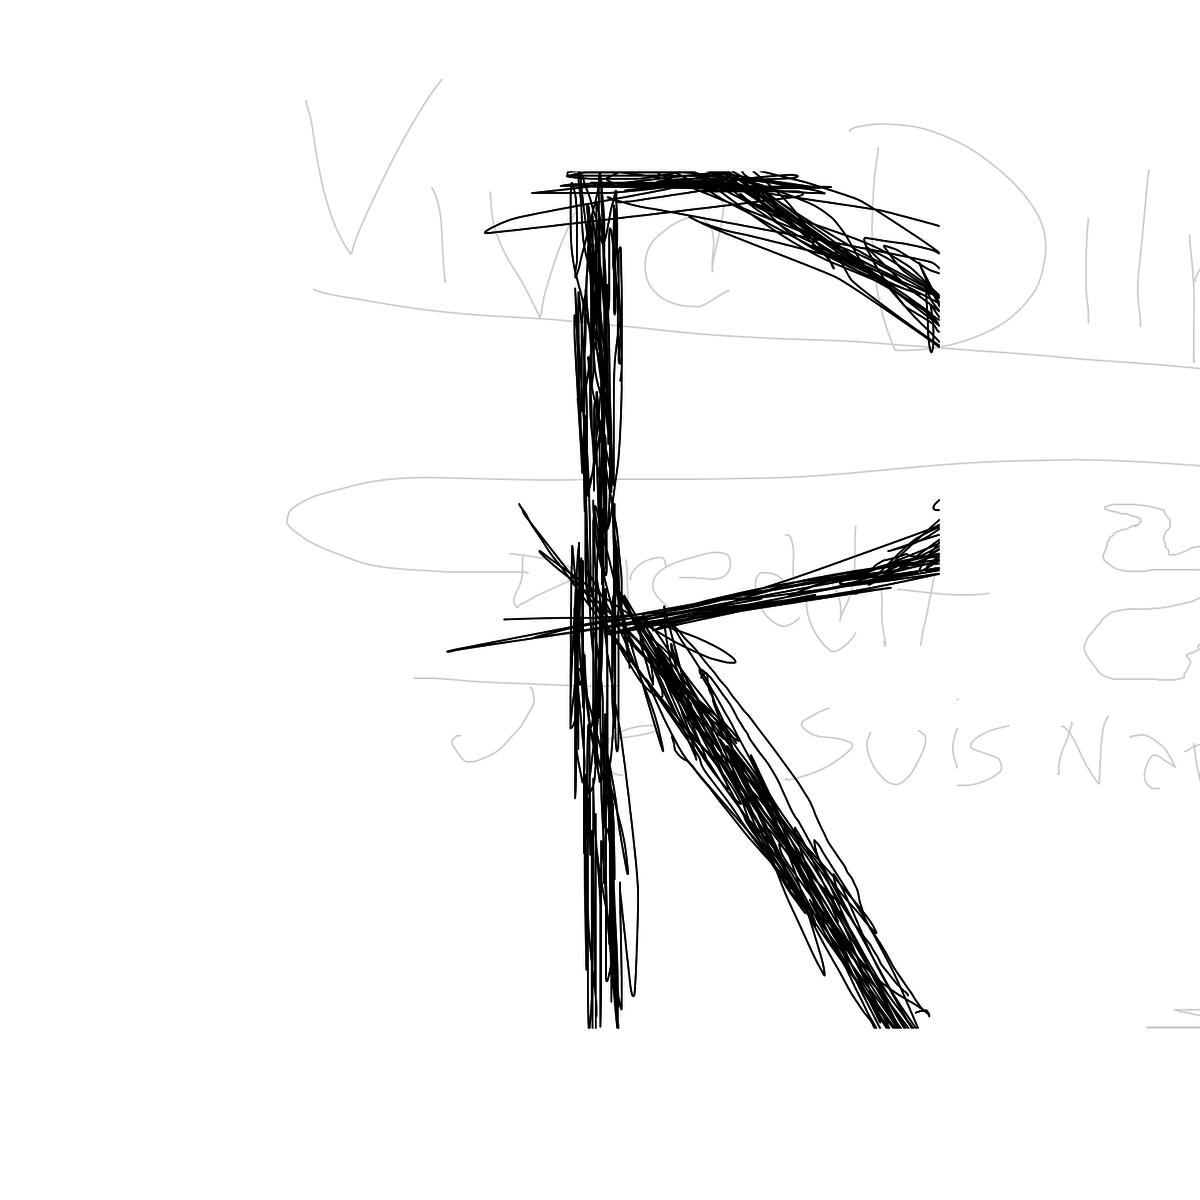 BAAAM drawing#7567 lat:-12.0500469207763670lng: -51.5040397644043000